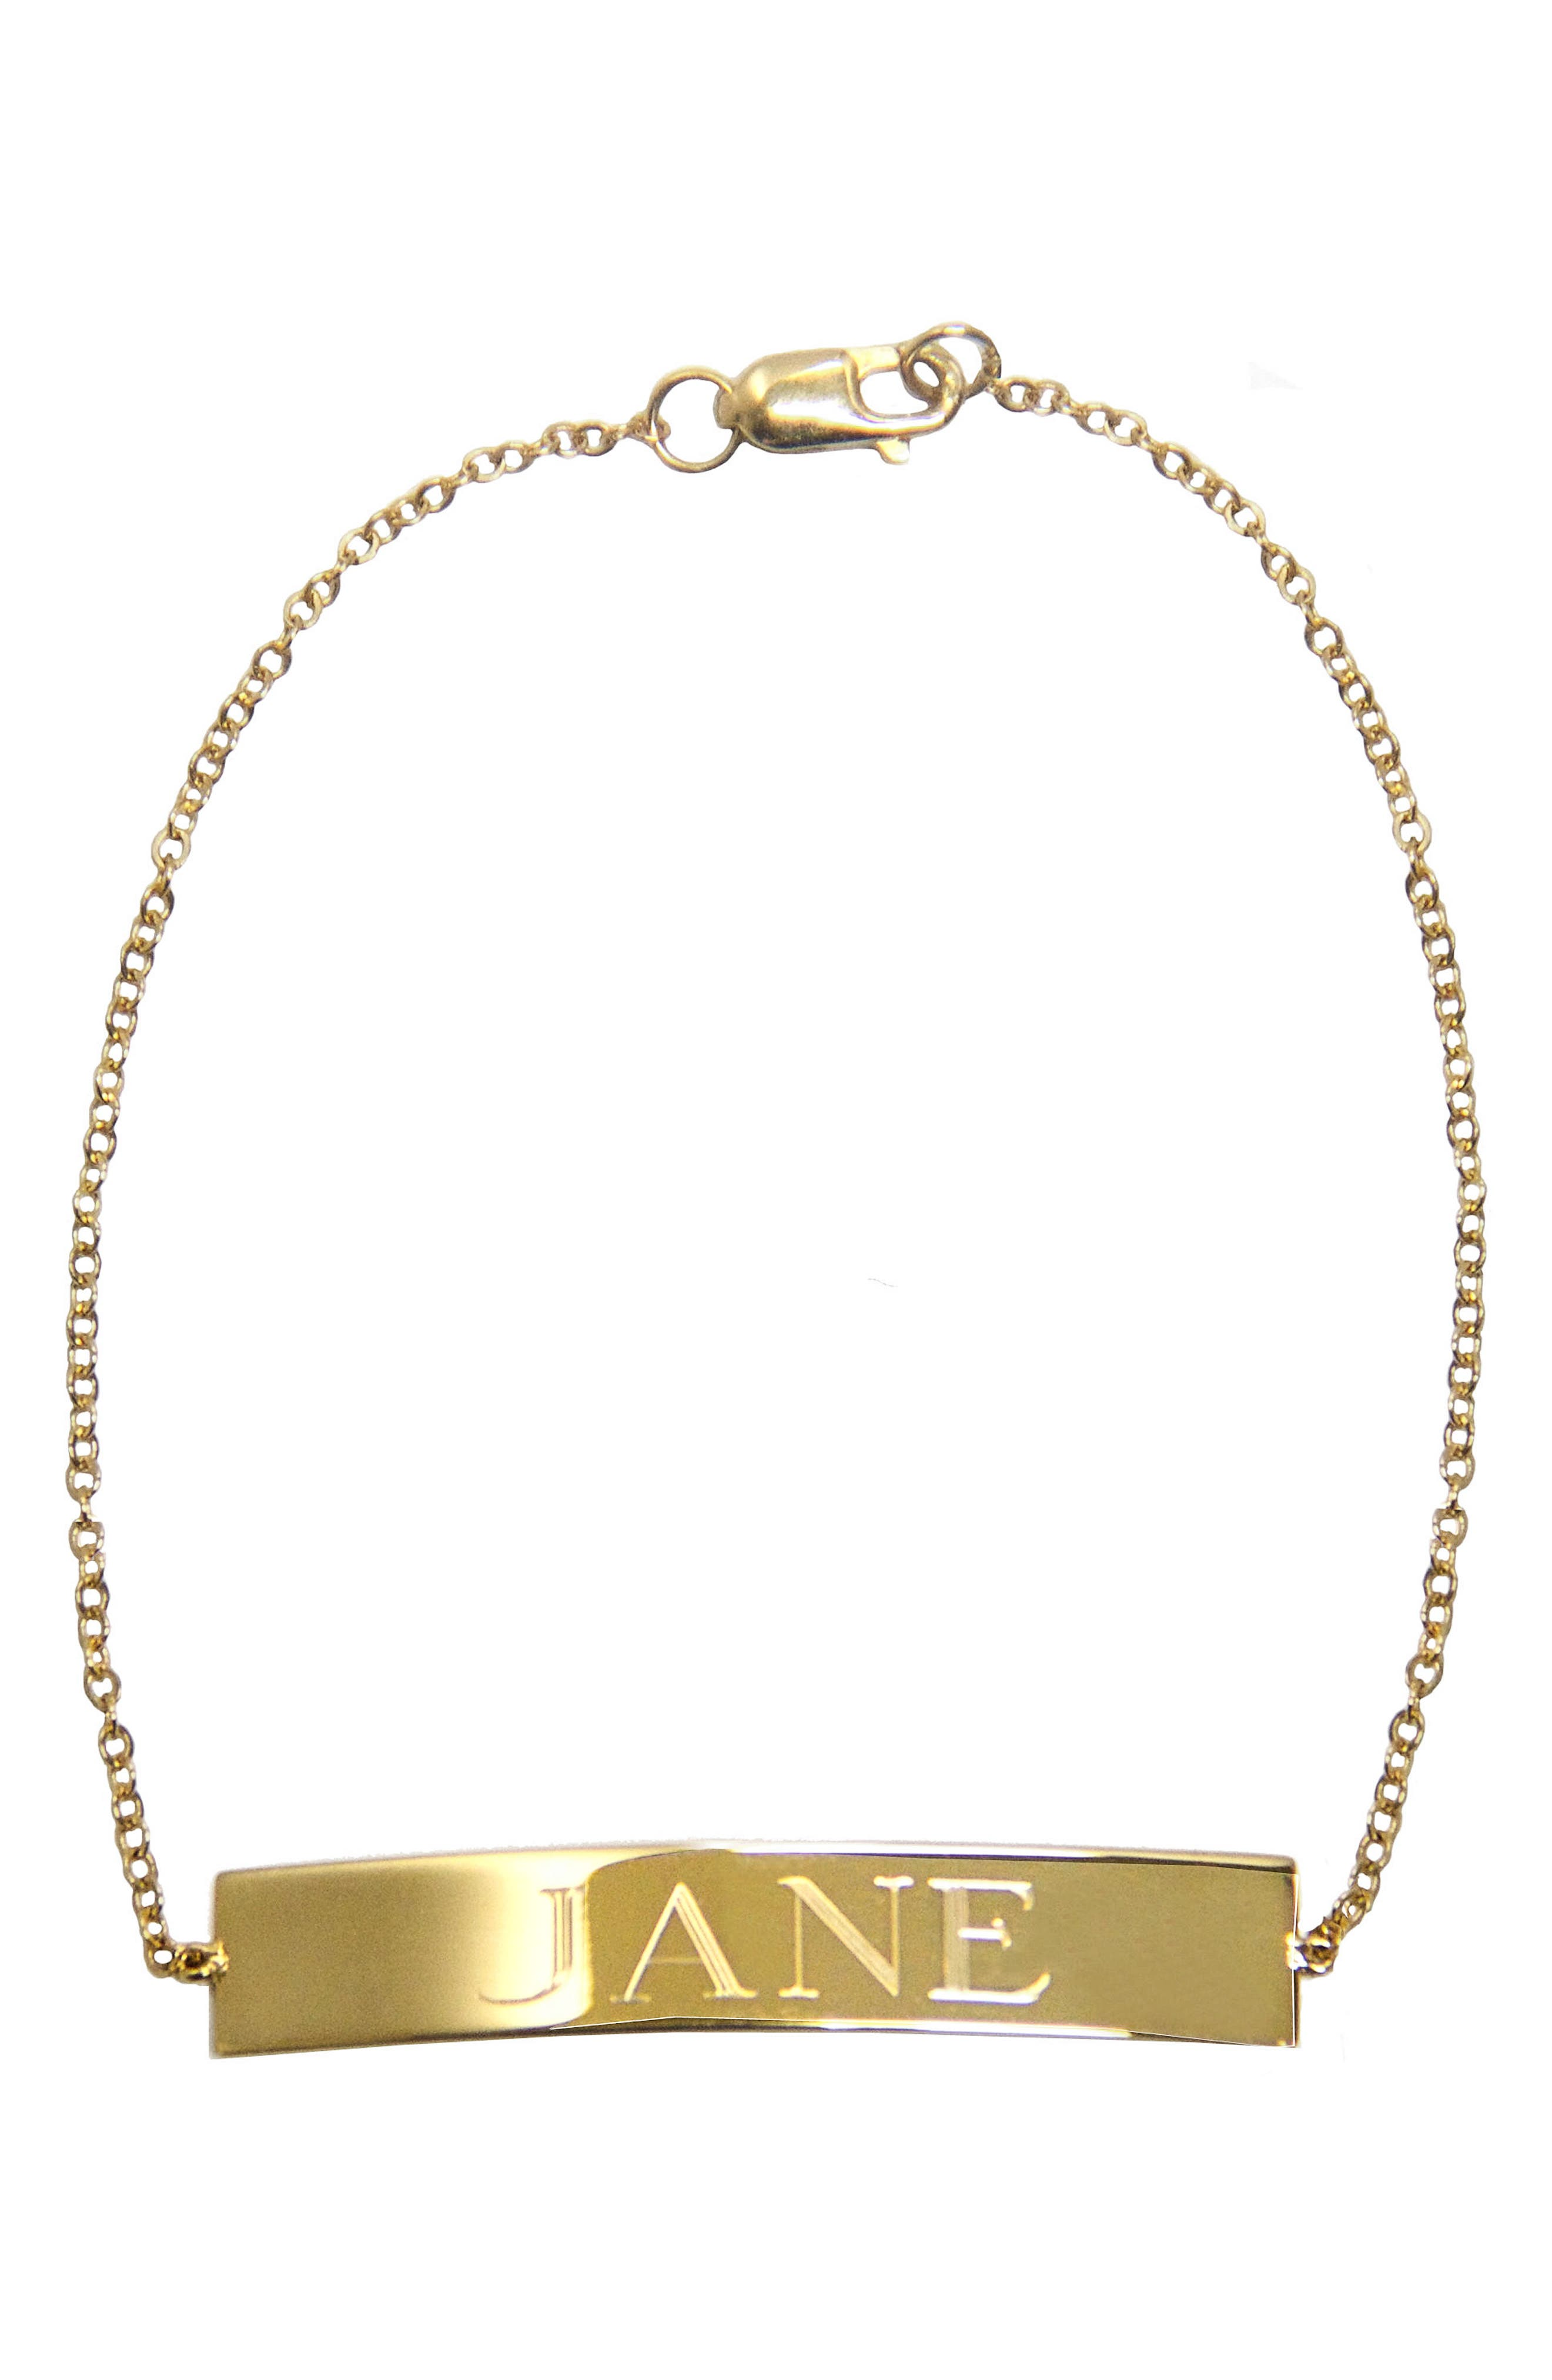 Jane Basch Personalized ID Bracelet,                             Main thumbnail 1, color,                             710